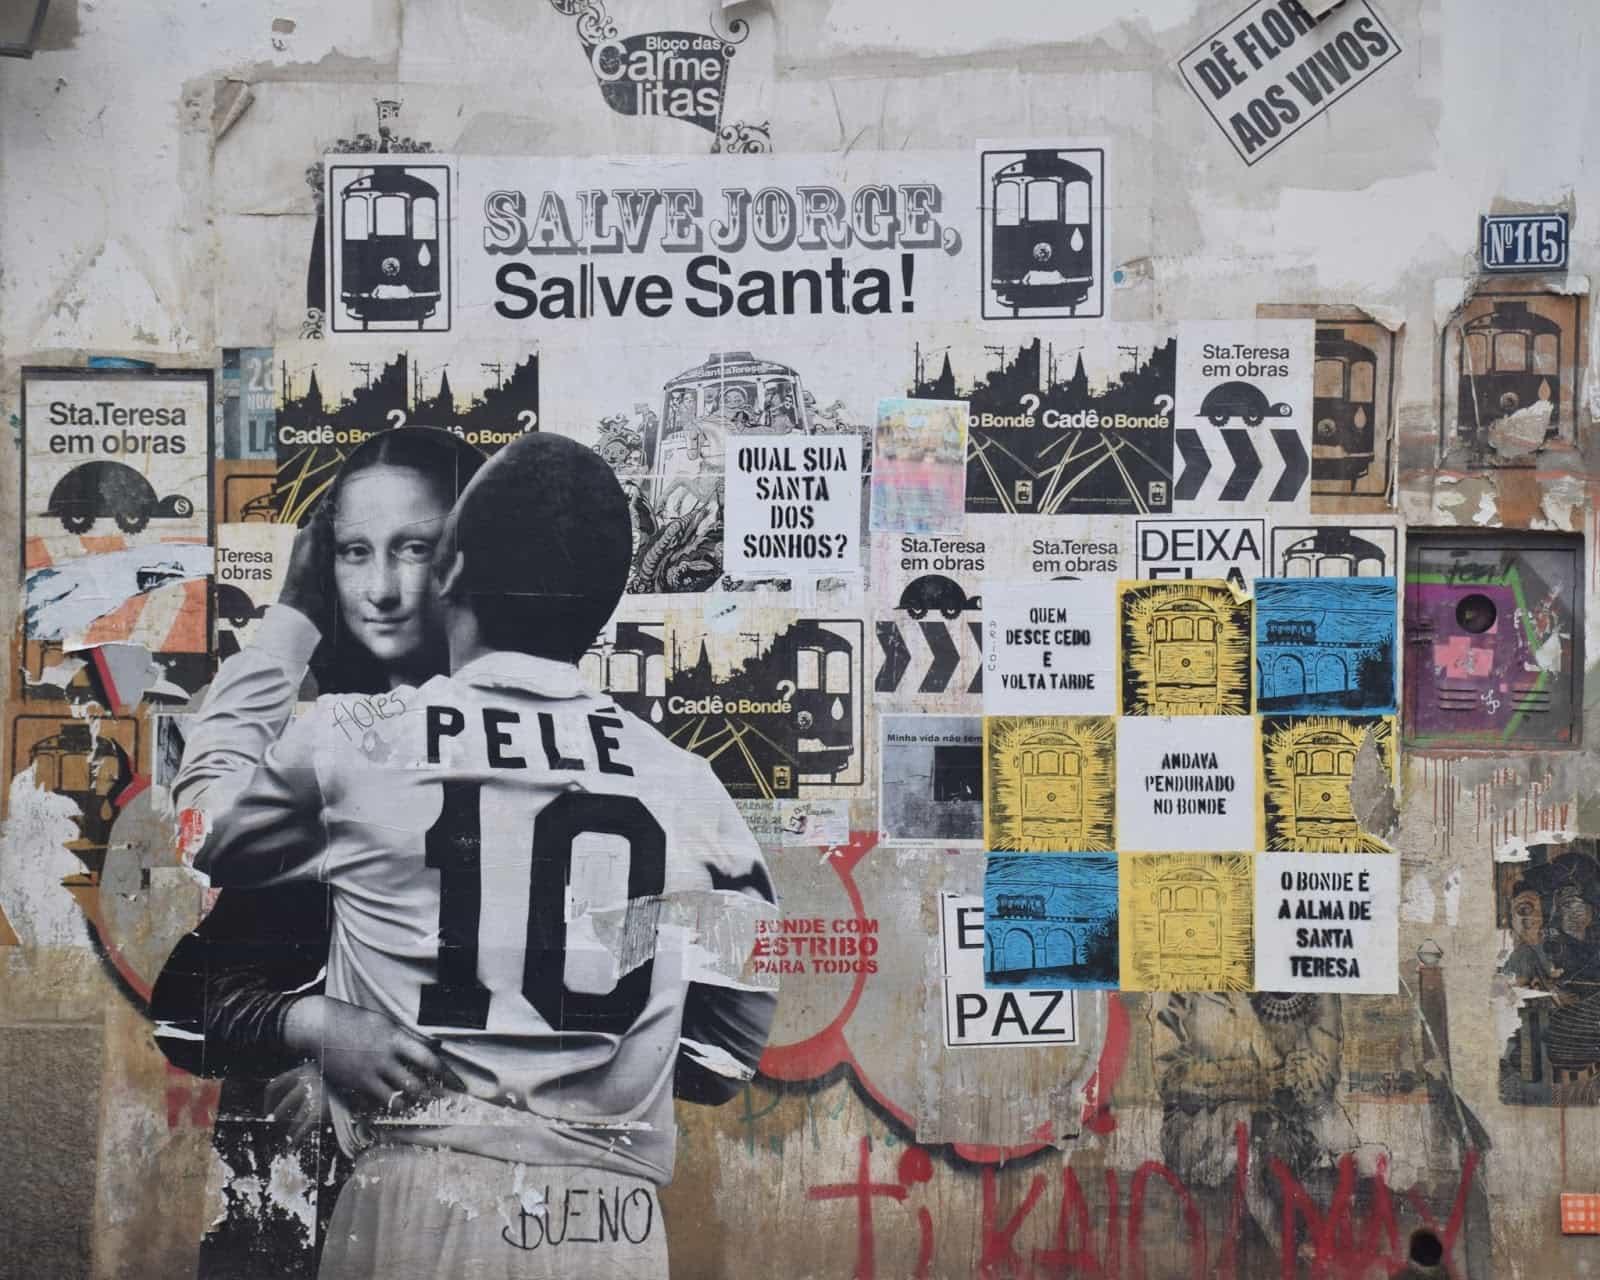 Graffiti Street Art pele football joconde streetart murale collage radar SPUTNIK - Coupe du Monde de football 2018 : les plus belles œuvres de street art !